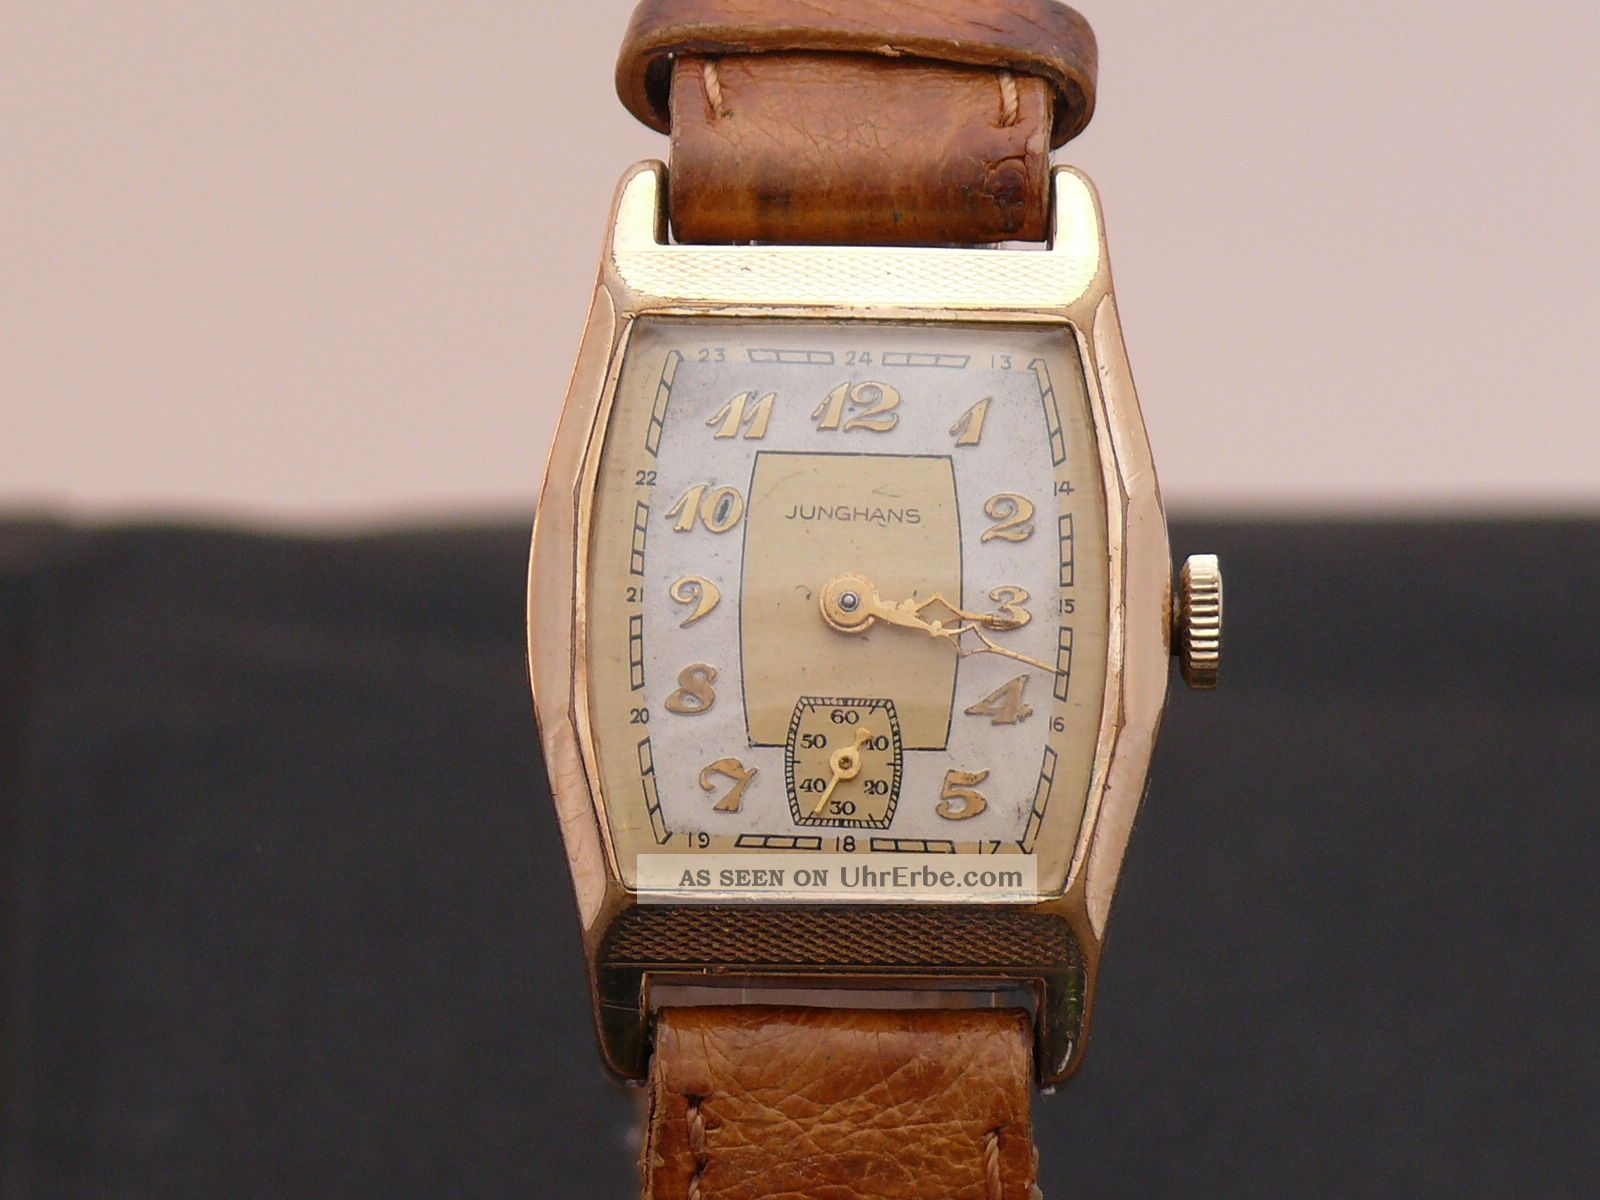 Junghans Armbanduhr 30er Jahre Kaliber 80 Superzustand Armbanduhren Bild